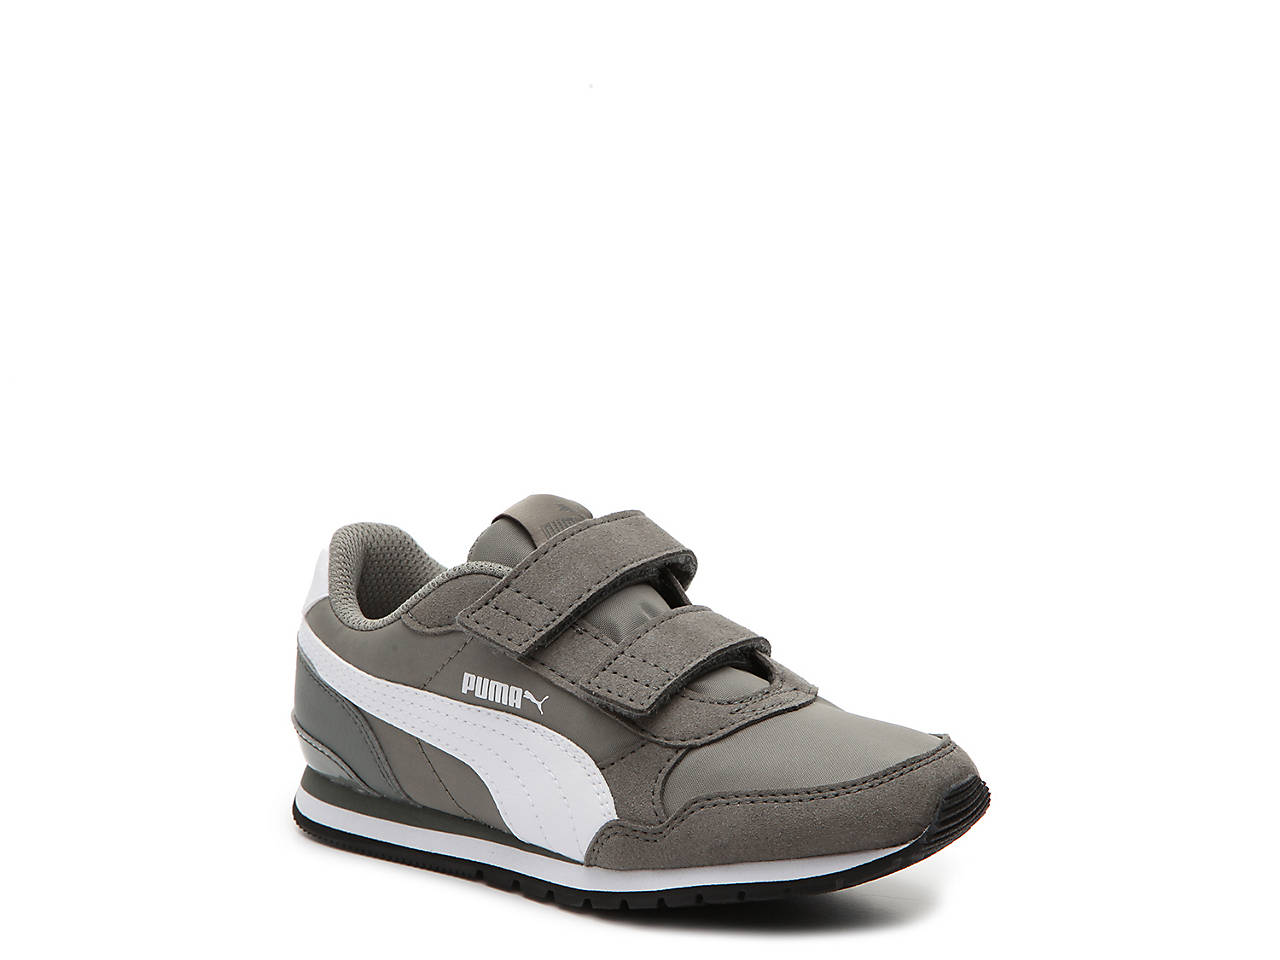 Puma ST Runner V2 Toddler   Youth Sneaker Kids Shoes  acbec84d4